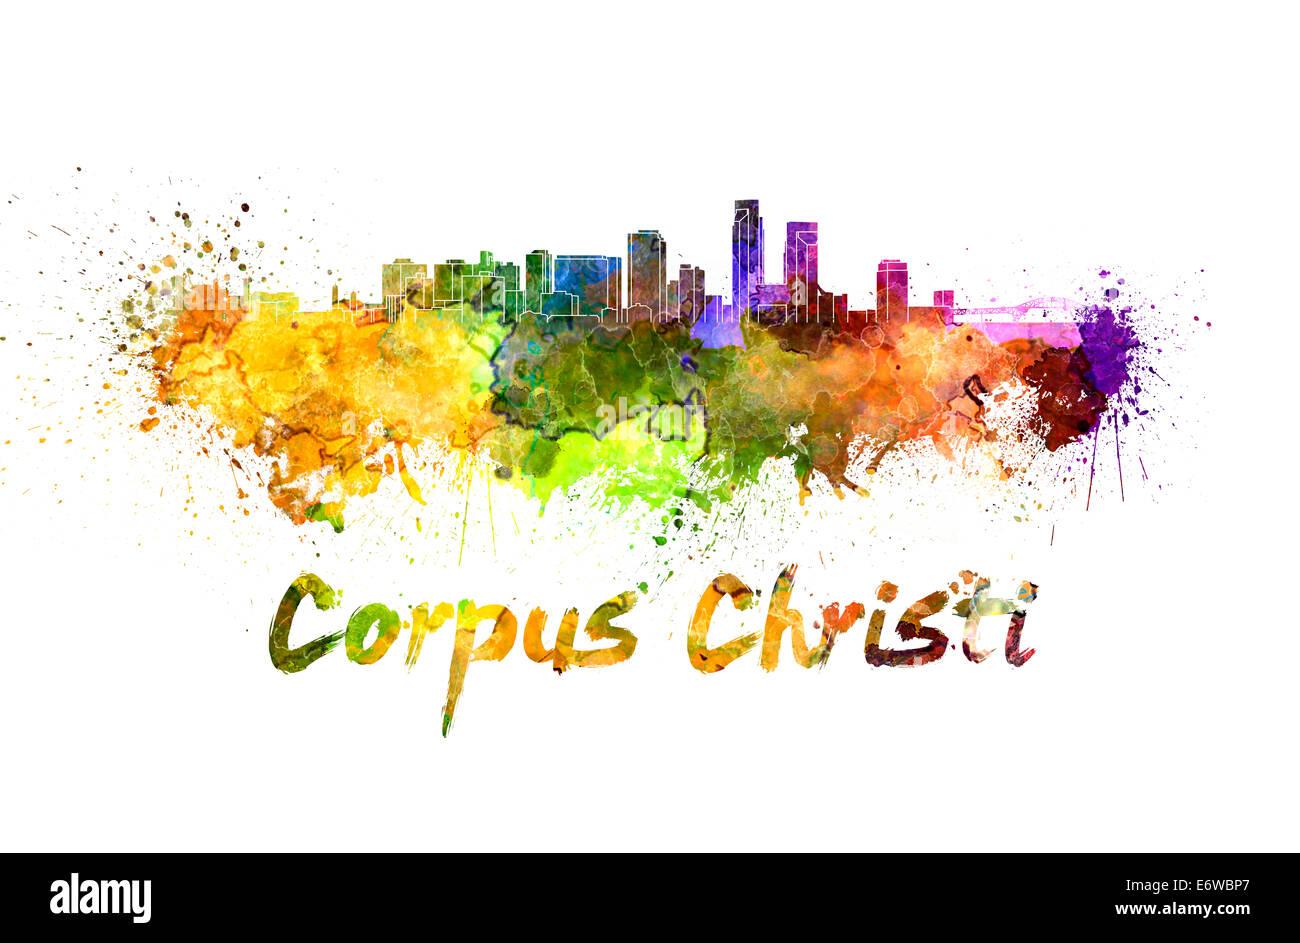 Corpus Christi skyline in watercolor - Stock Image